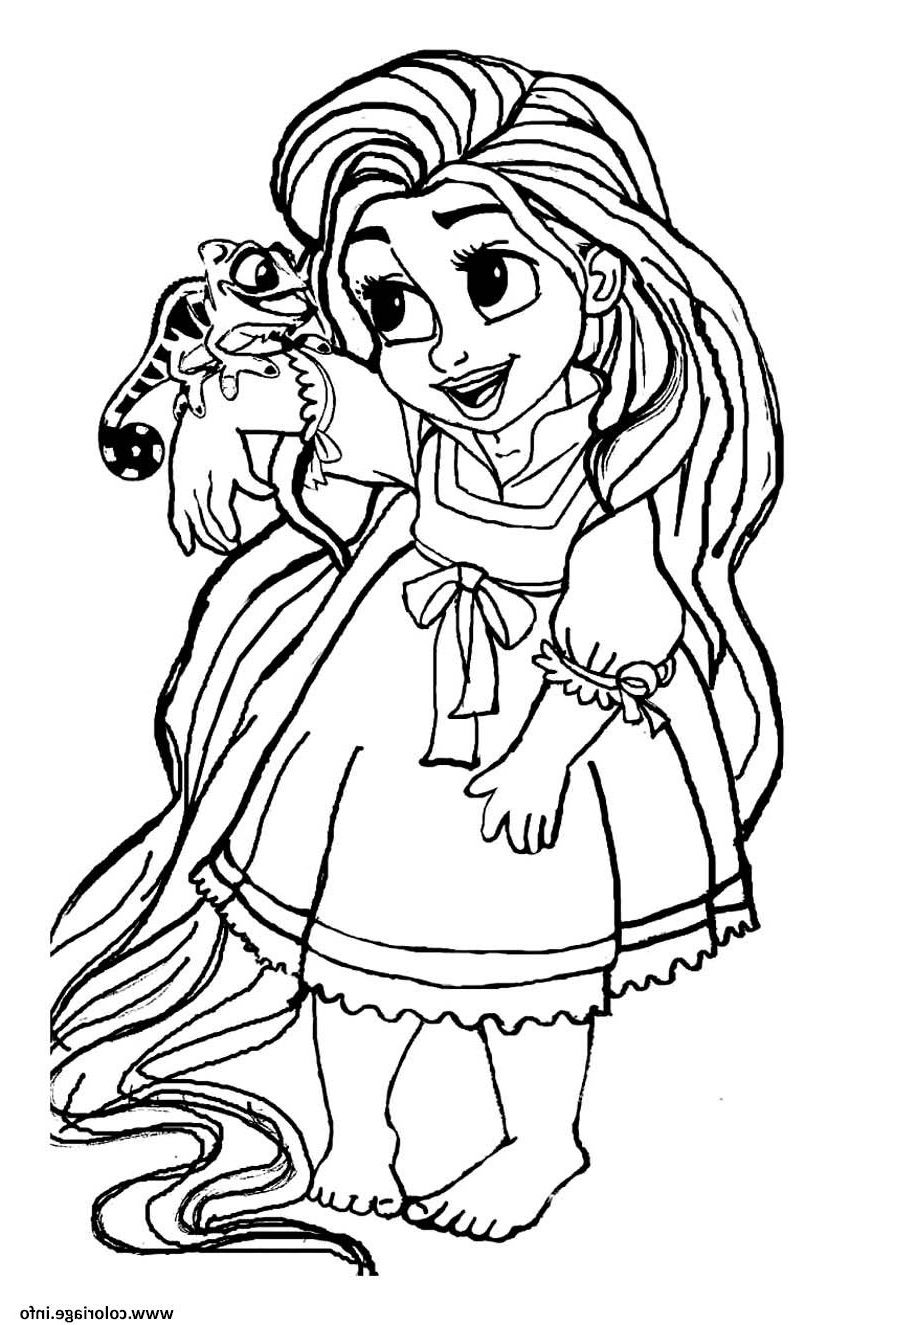 Coloriage Bebe Raiponce Princesse Disney Cute dessin  Rapunzel